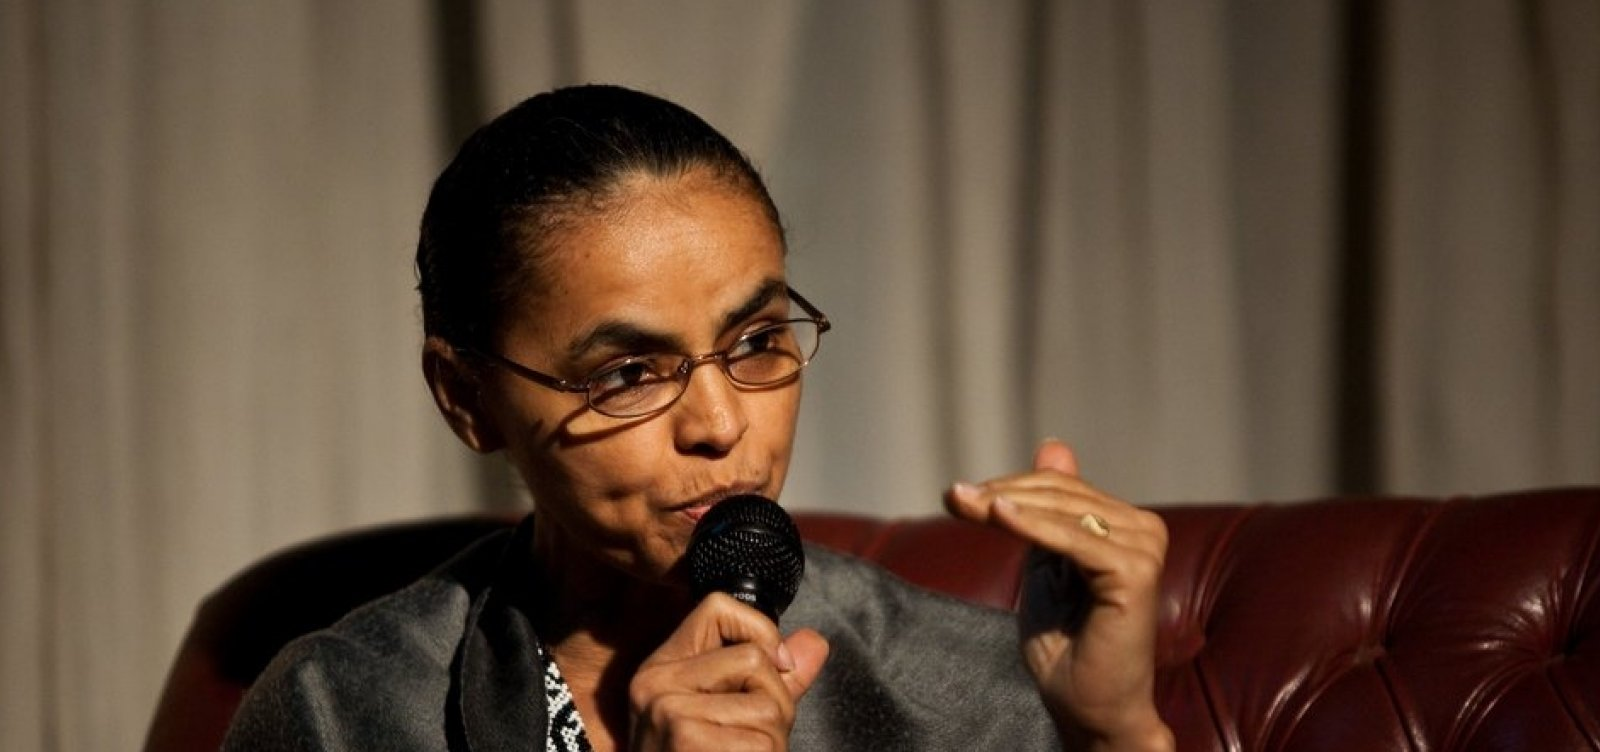 Marina comete ato falho e se autointitula presidente do Brasil